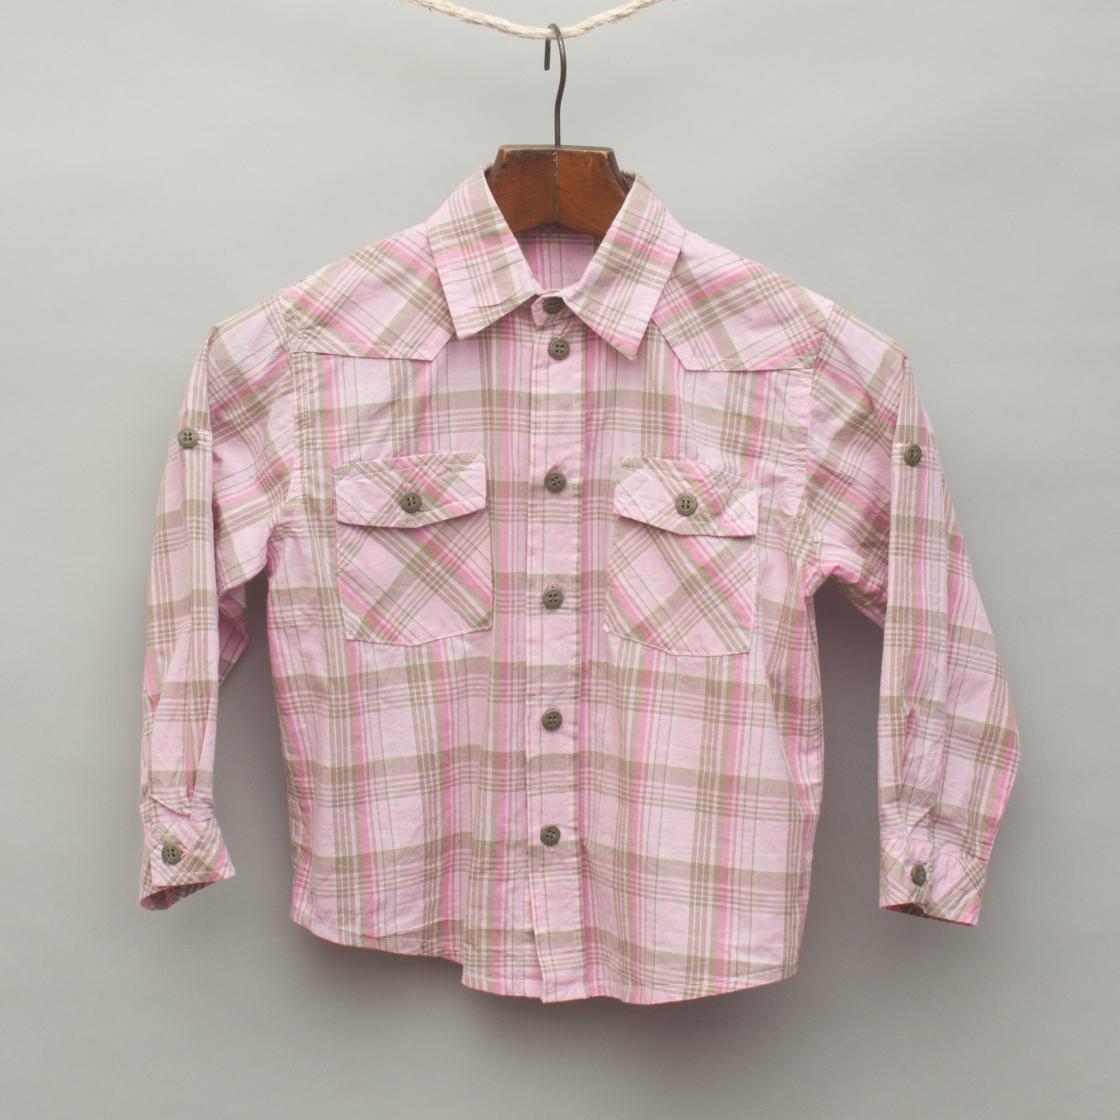 Pink Plaid Shirt